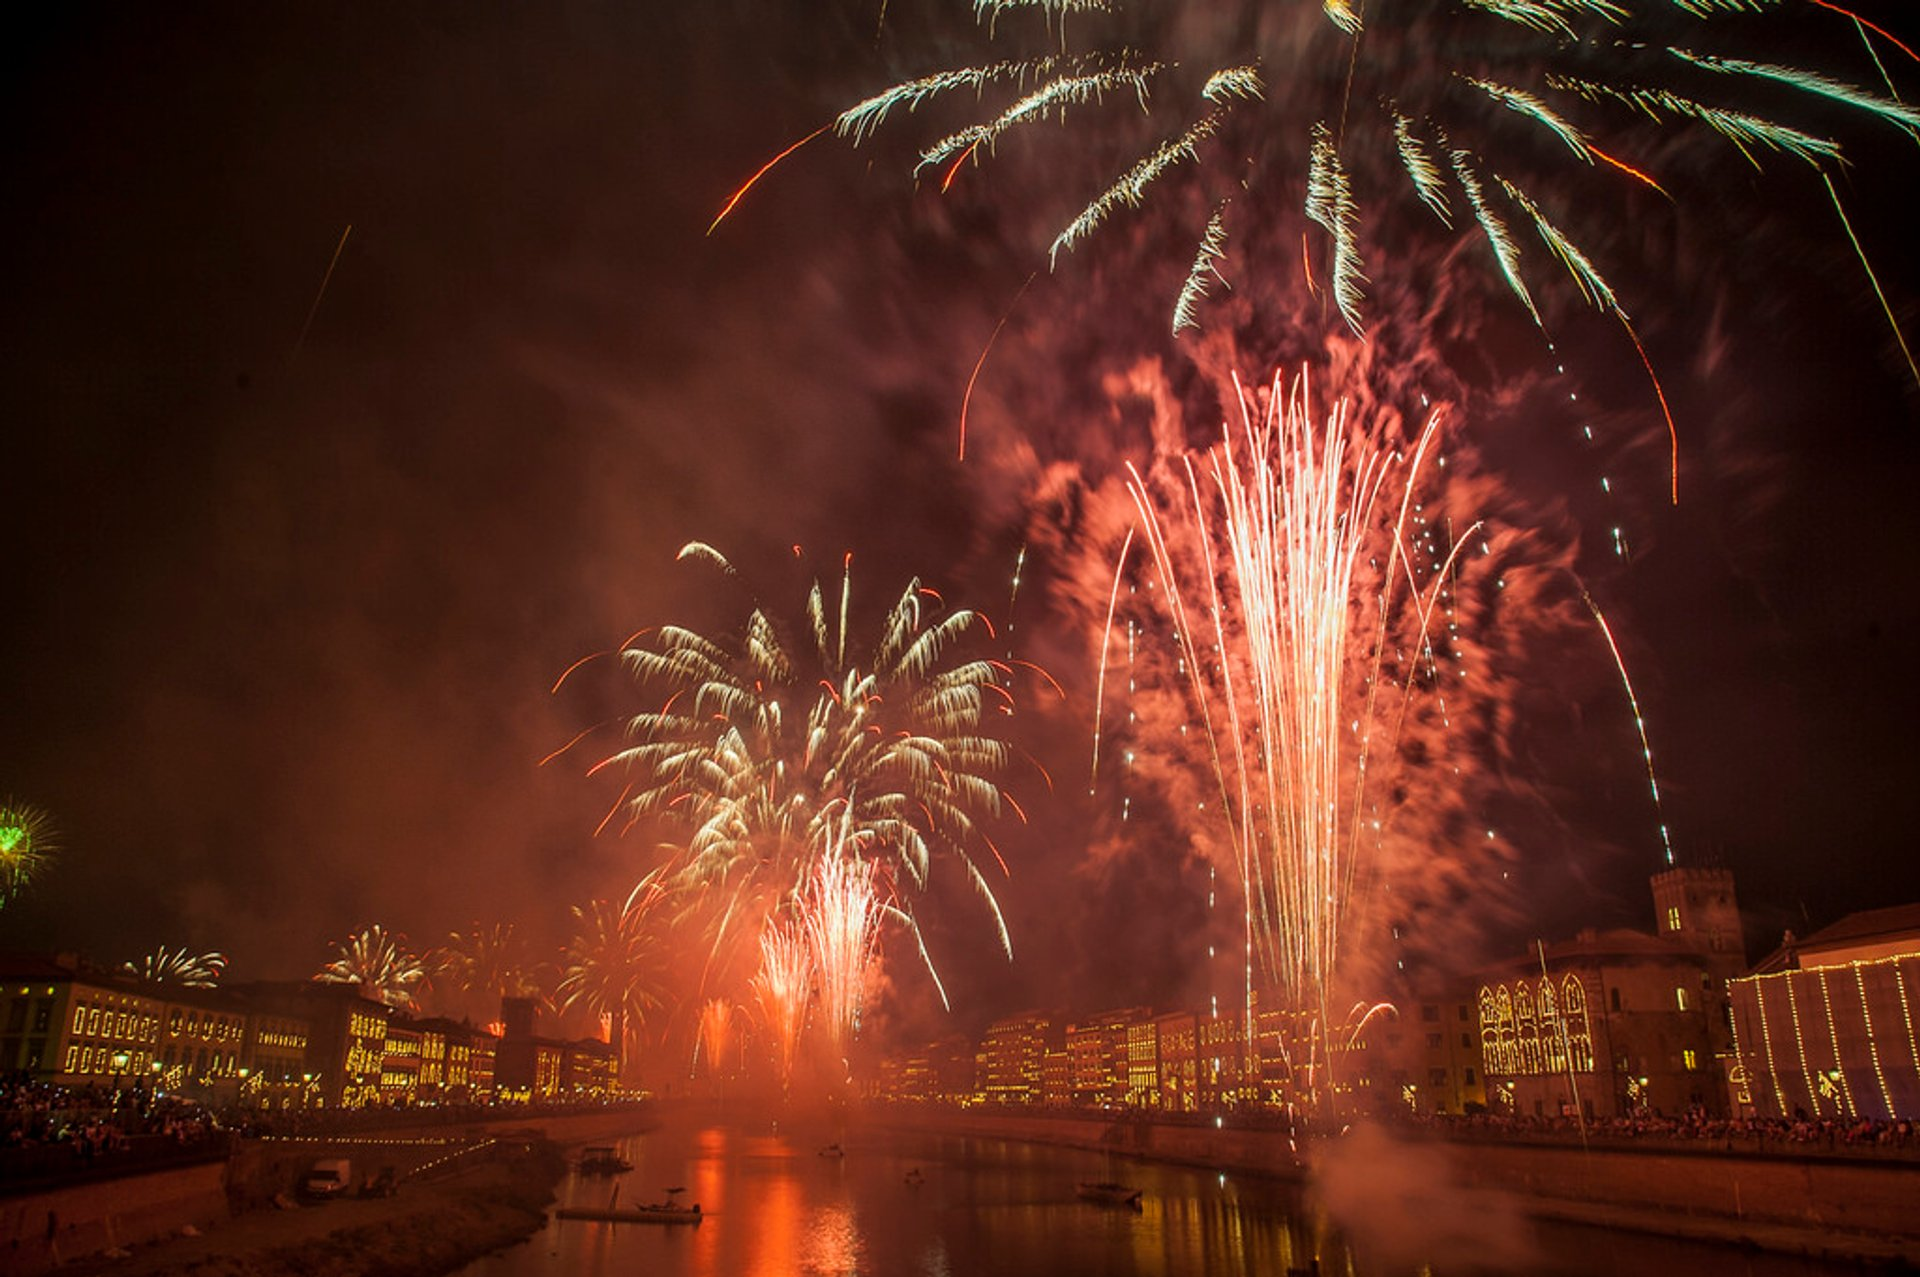 Luminara of San Ranieri Pisa in Tuscany 2020 - Best Time